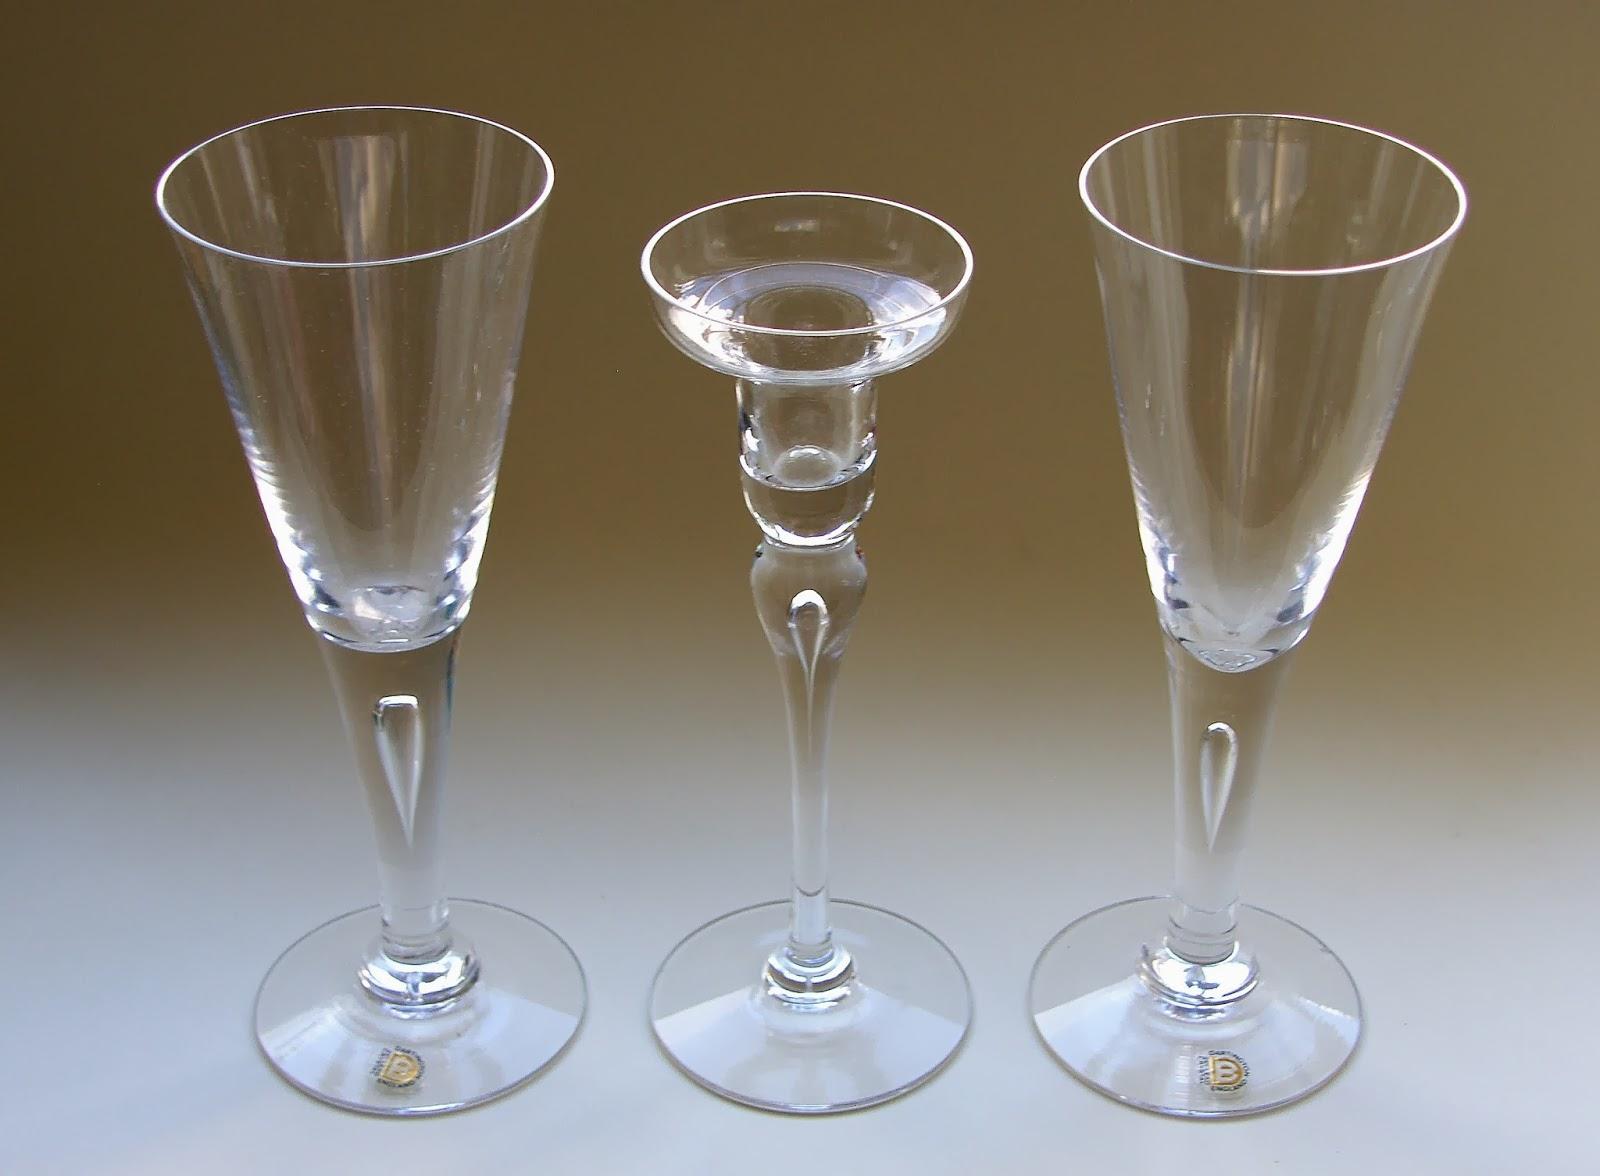 Dartington Crystal Glass Daisy Paperweight Ft 208 Dartington Pottery, Porcelain & Glass